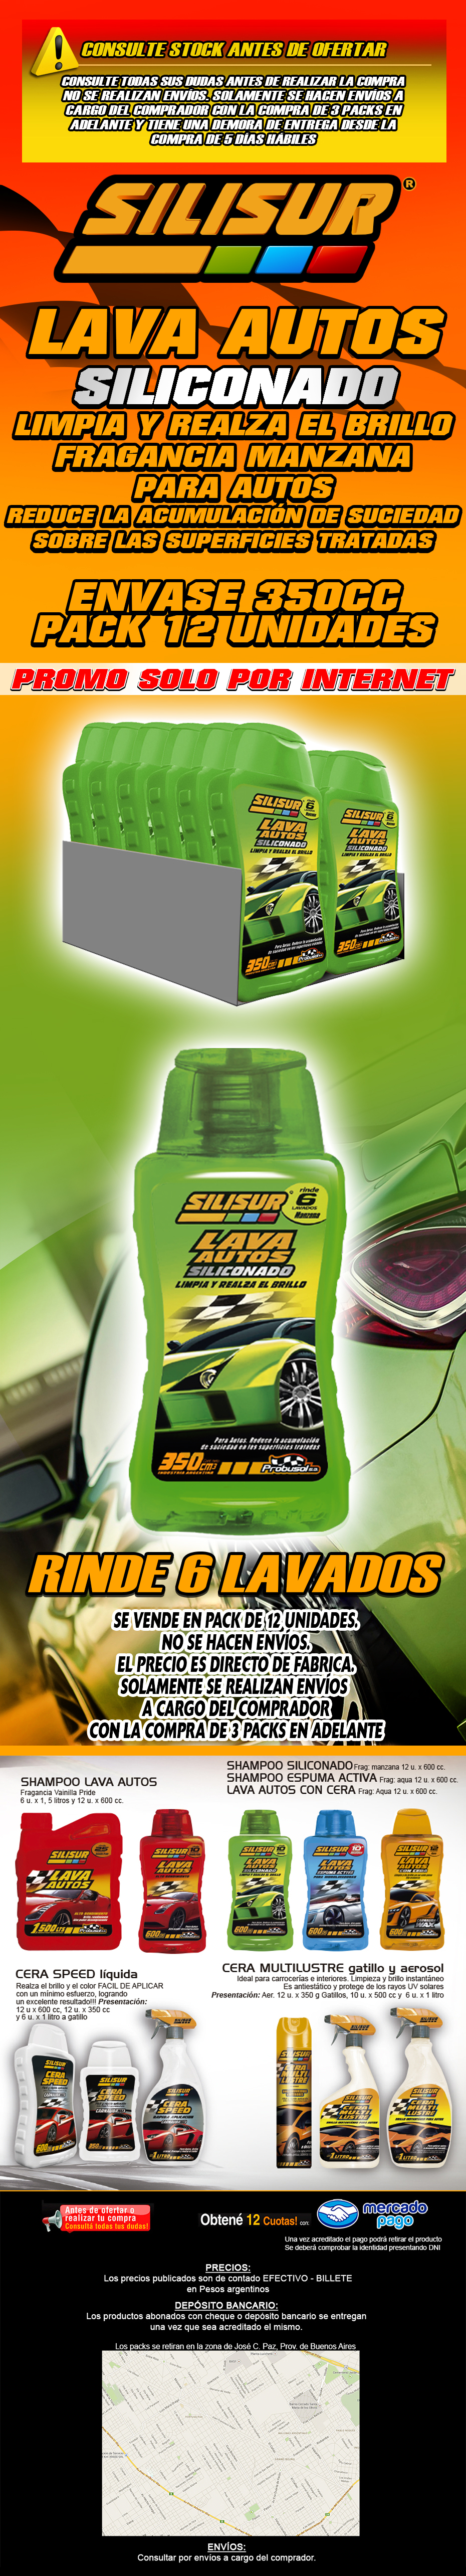 silisur shampoo lava autos siliconado manzana 350cc pack 12u.